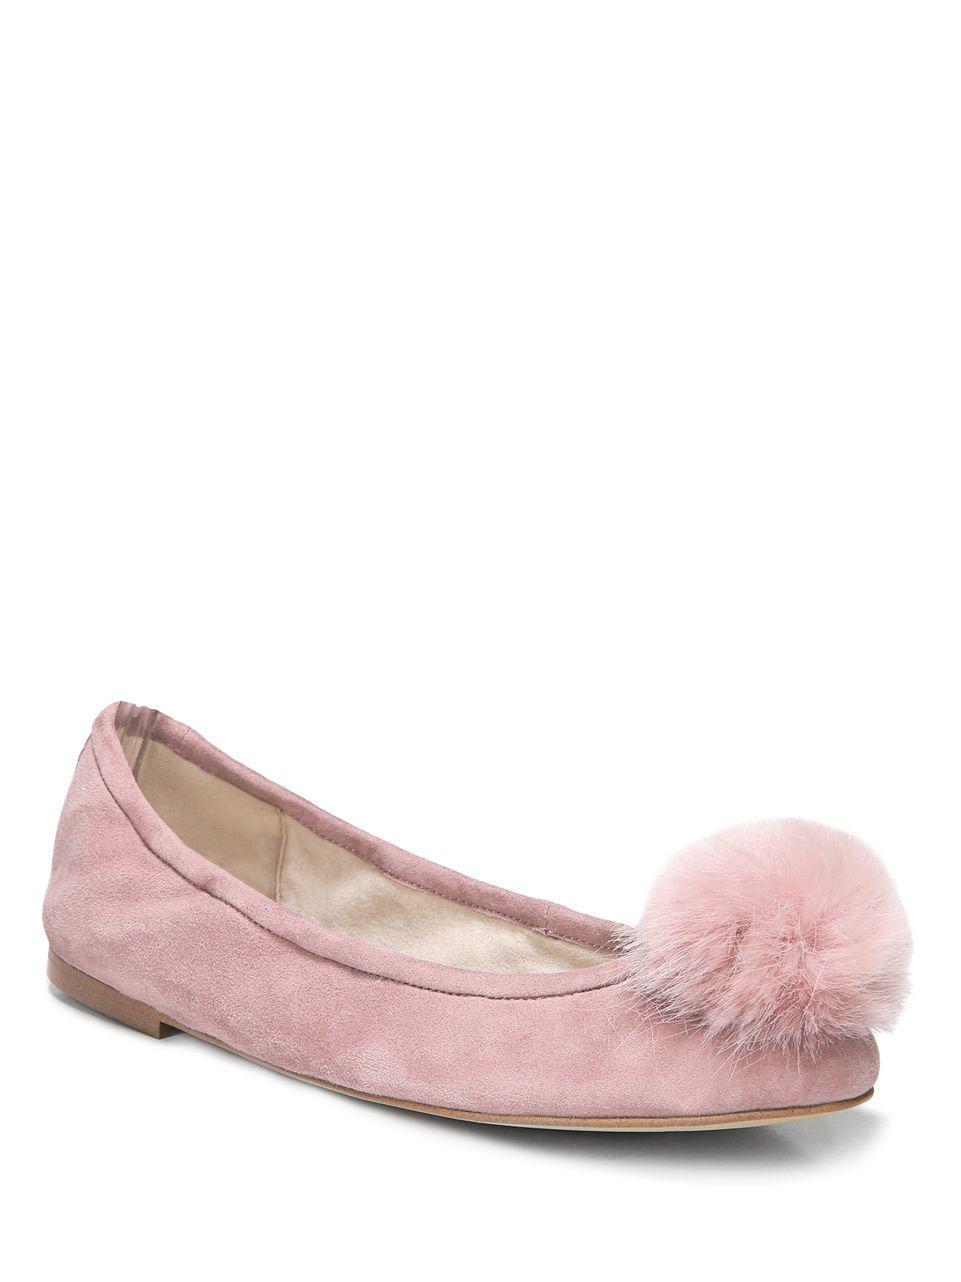 97107d84f Lyst - Sam Edelman Farina Faux Fur Pom-accented Flats in Purple